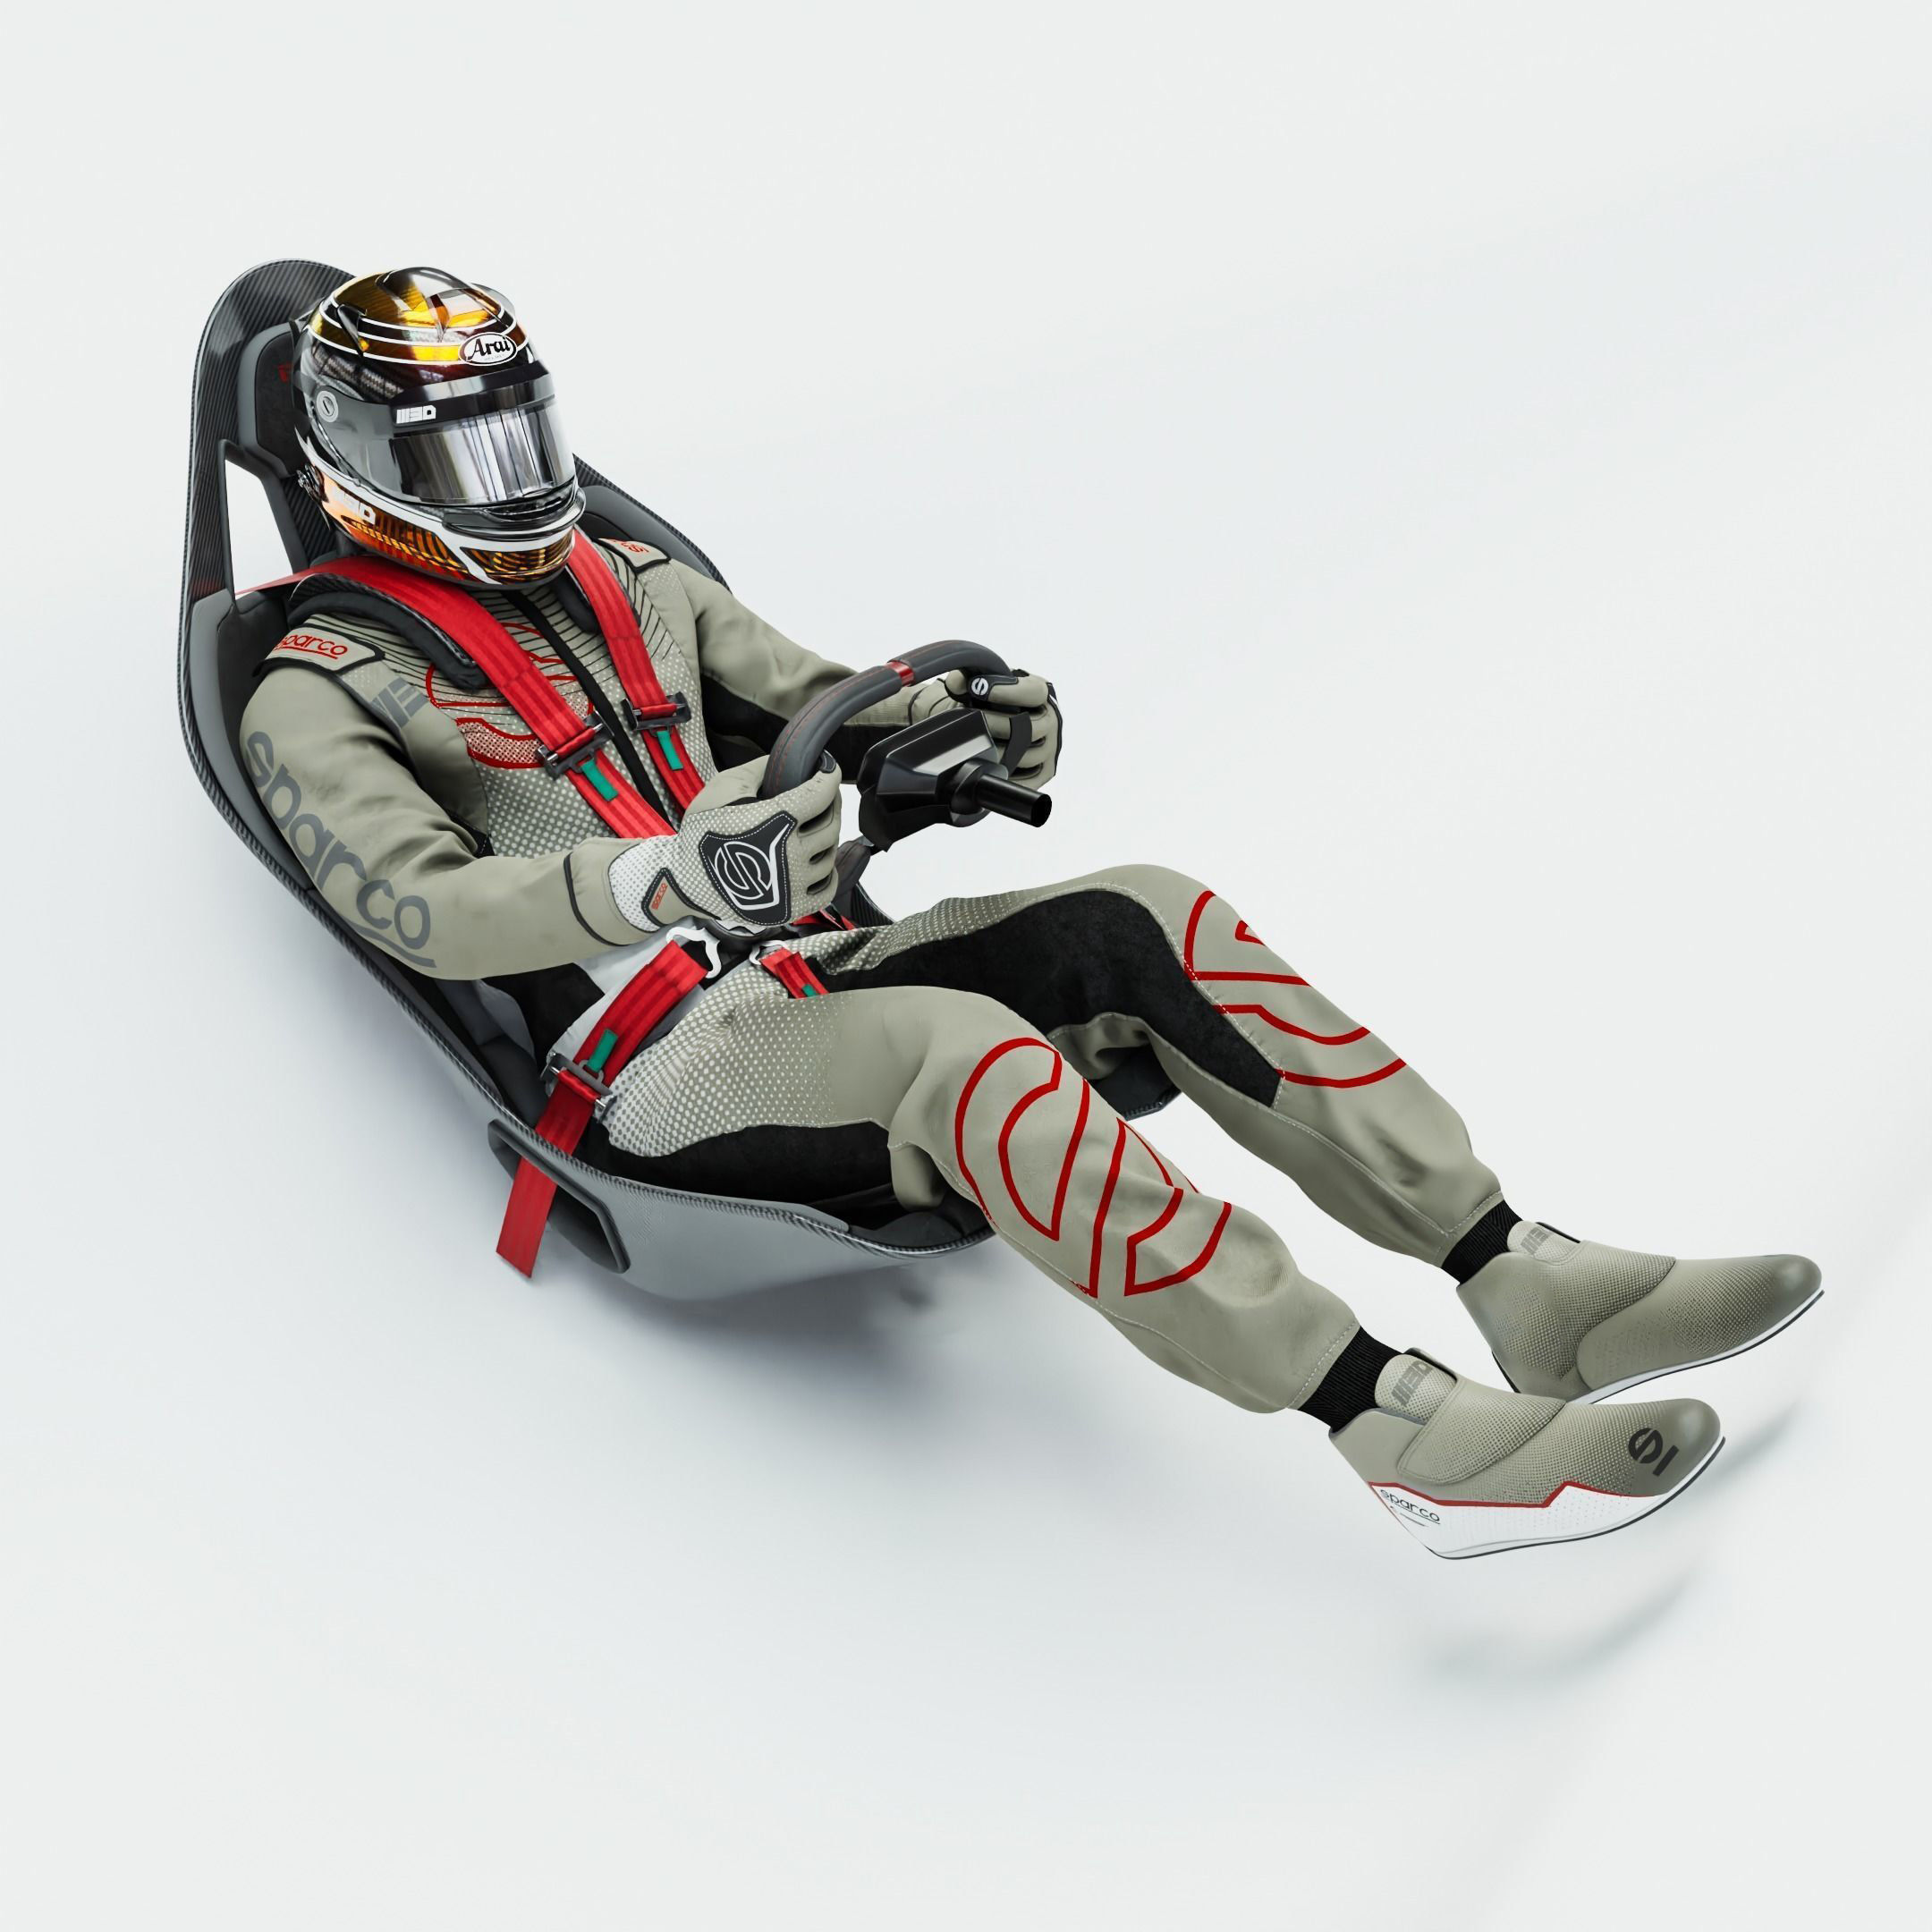 High Quality Race Driver Suit